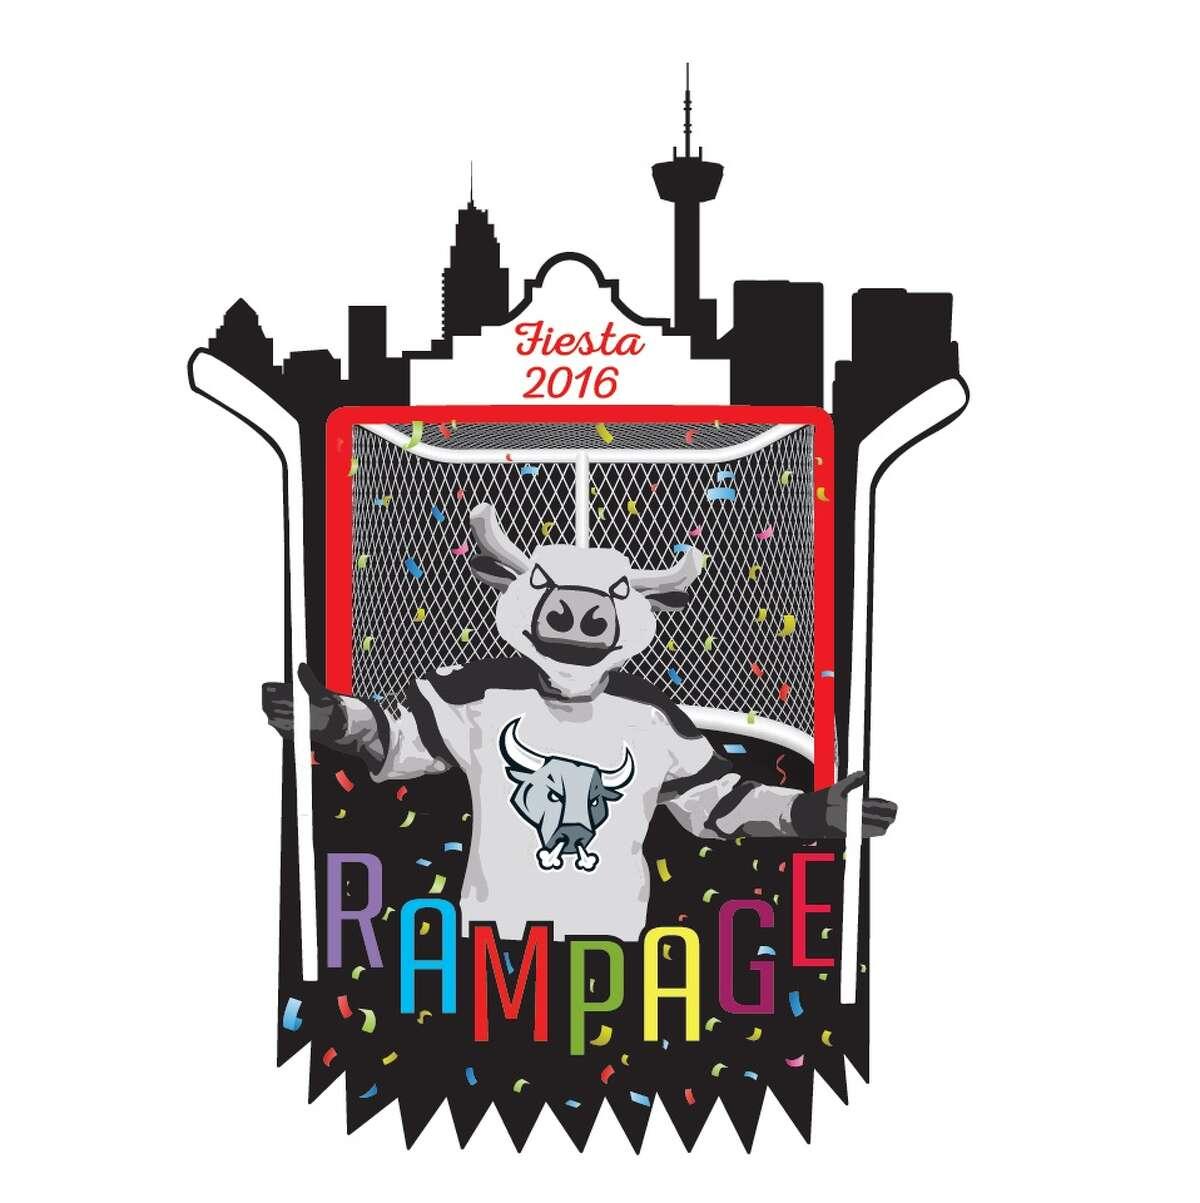 San Antonio Rampage Fiesta Medal design for 2016, by Jason Smith